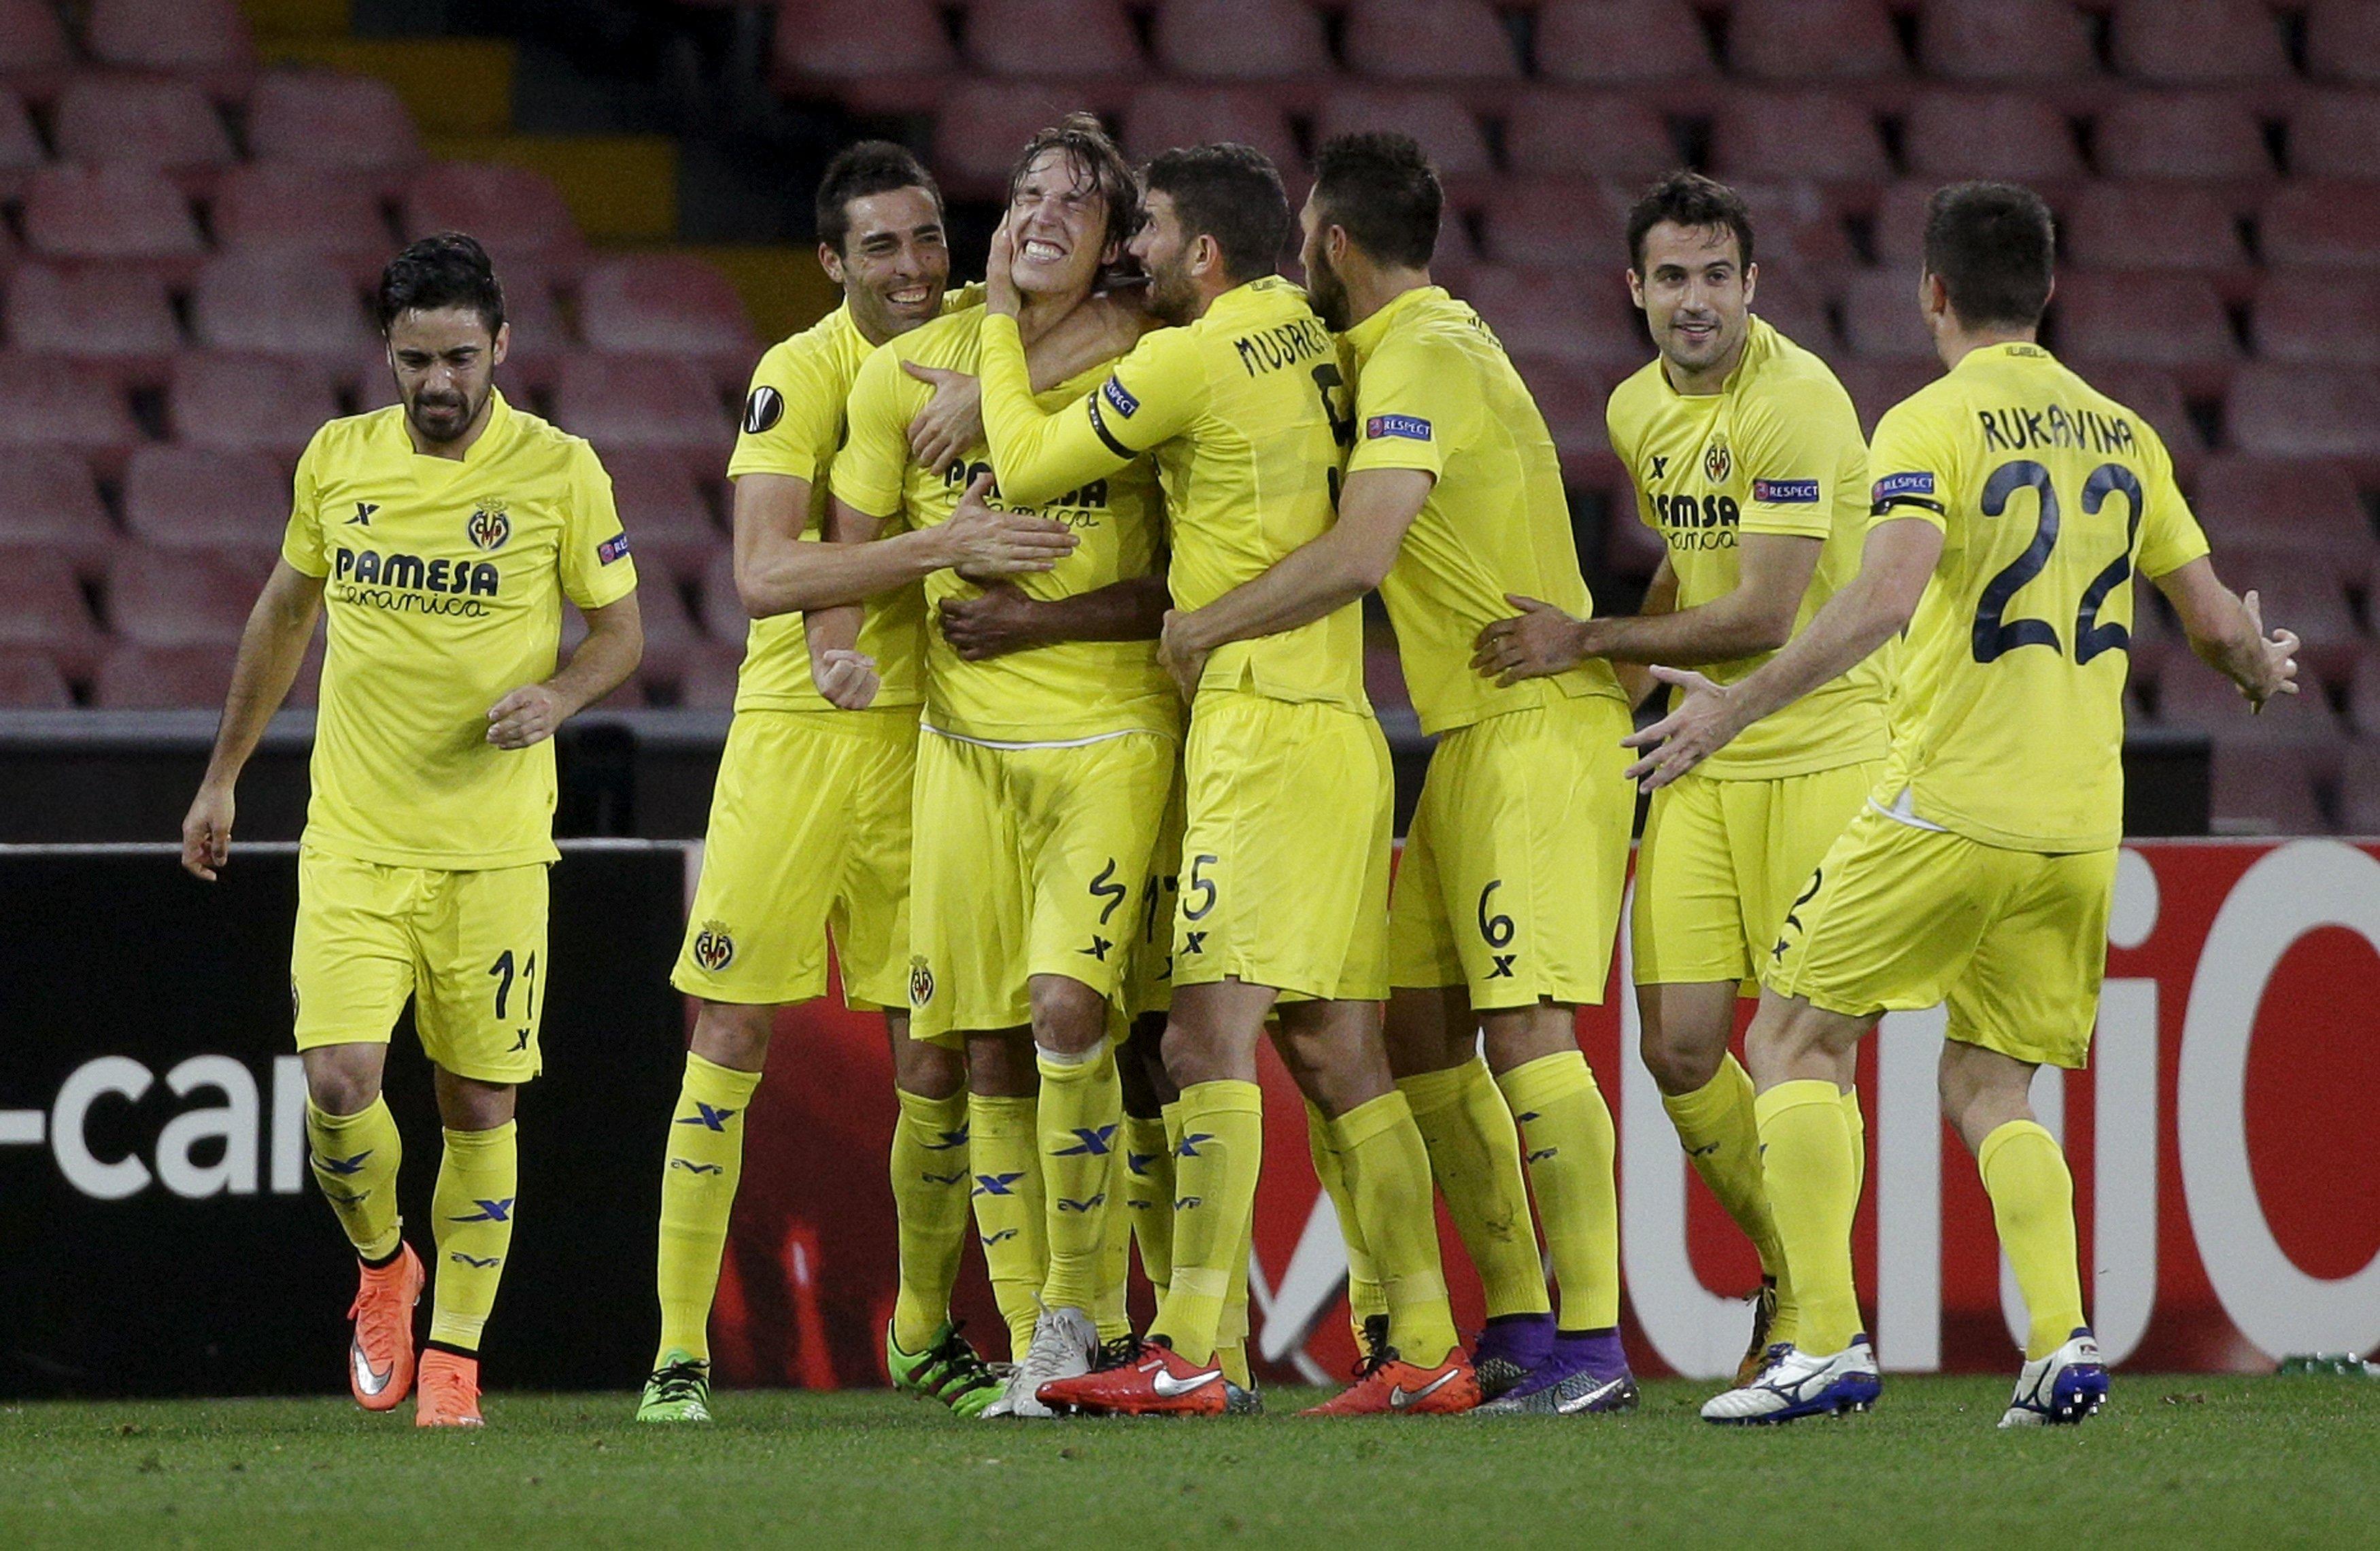 Football Soccer - Napoli v Villarreal - Europa League